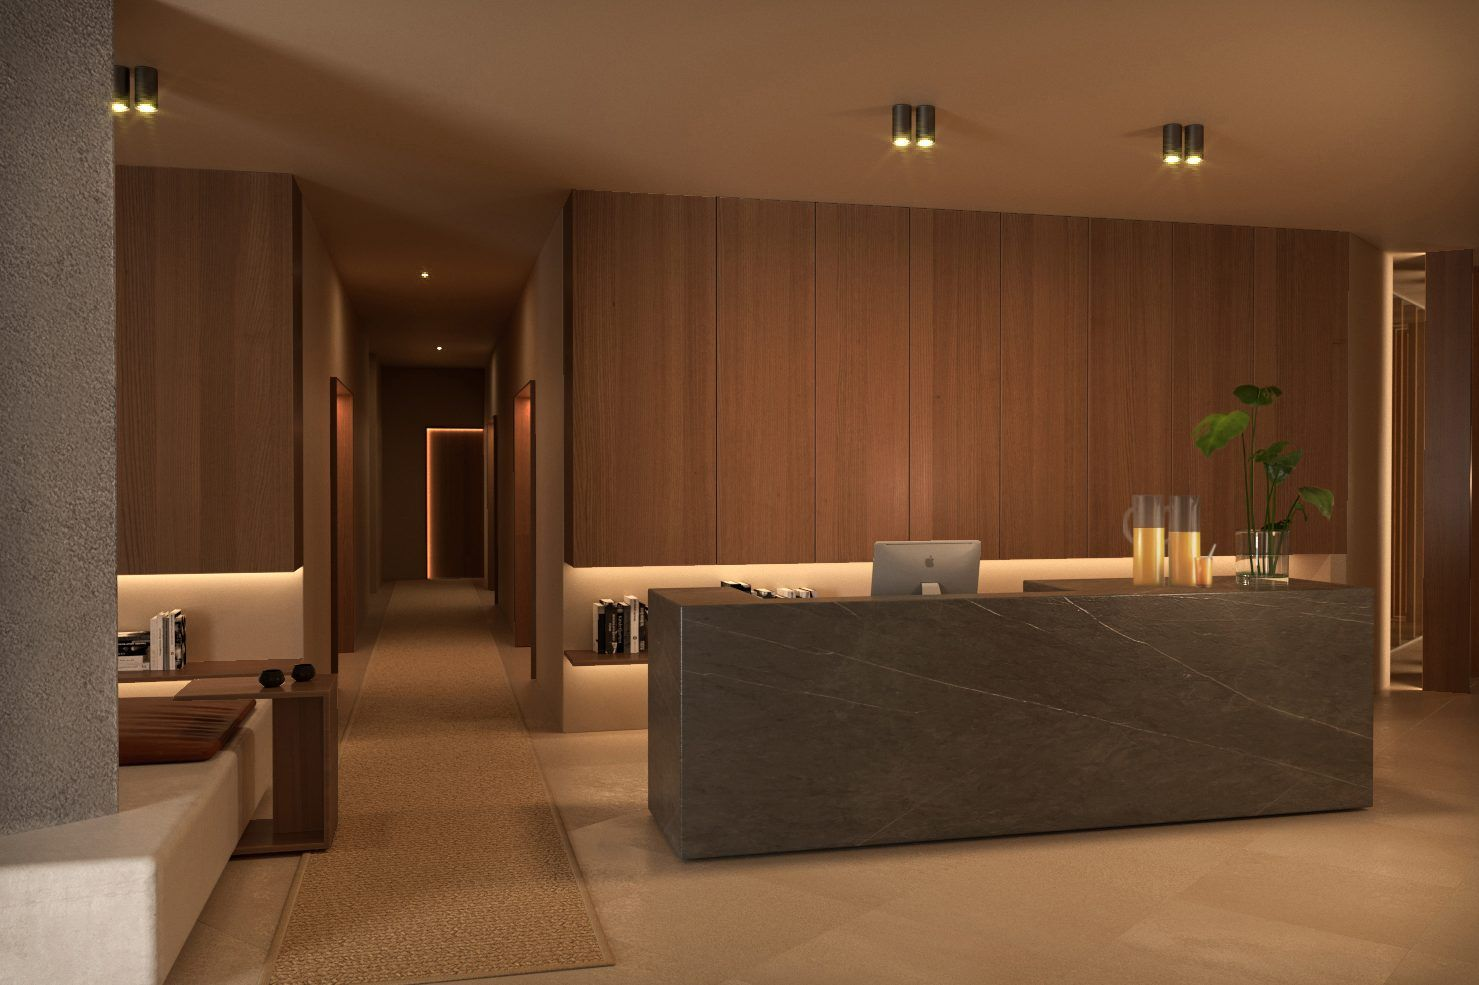 HOTEL ARIMA TRENCHS STUDIO 3